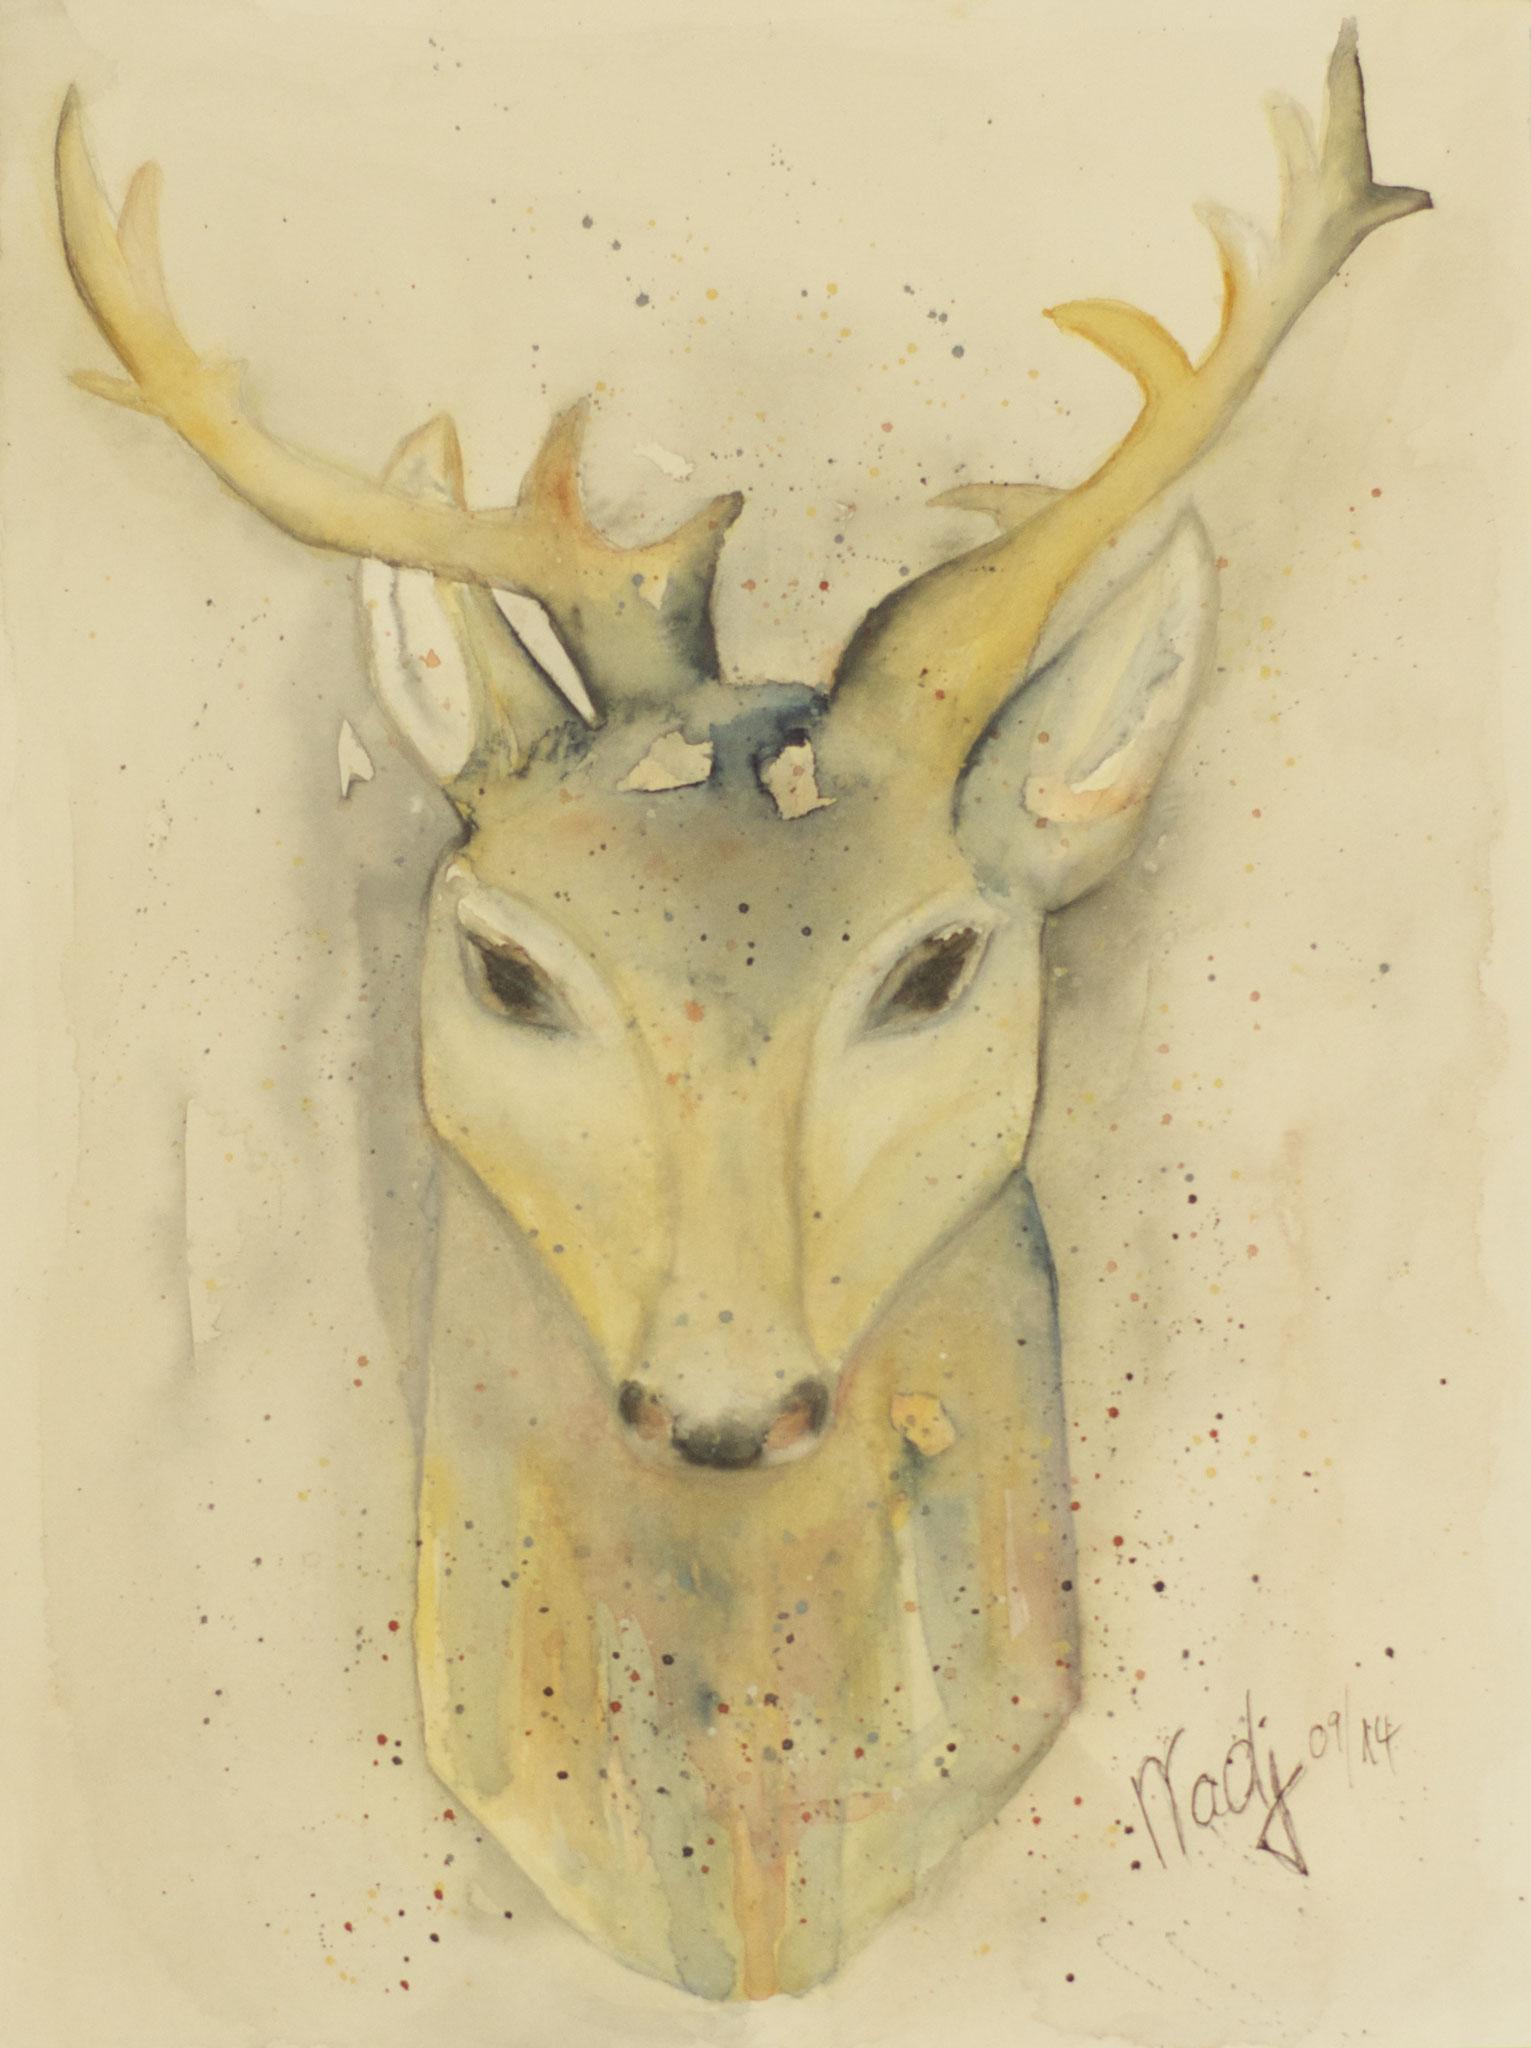 Hirsch Aquarell 23X30.5cm Bild Nr.55 Verkauft